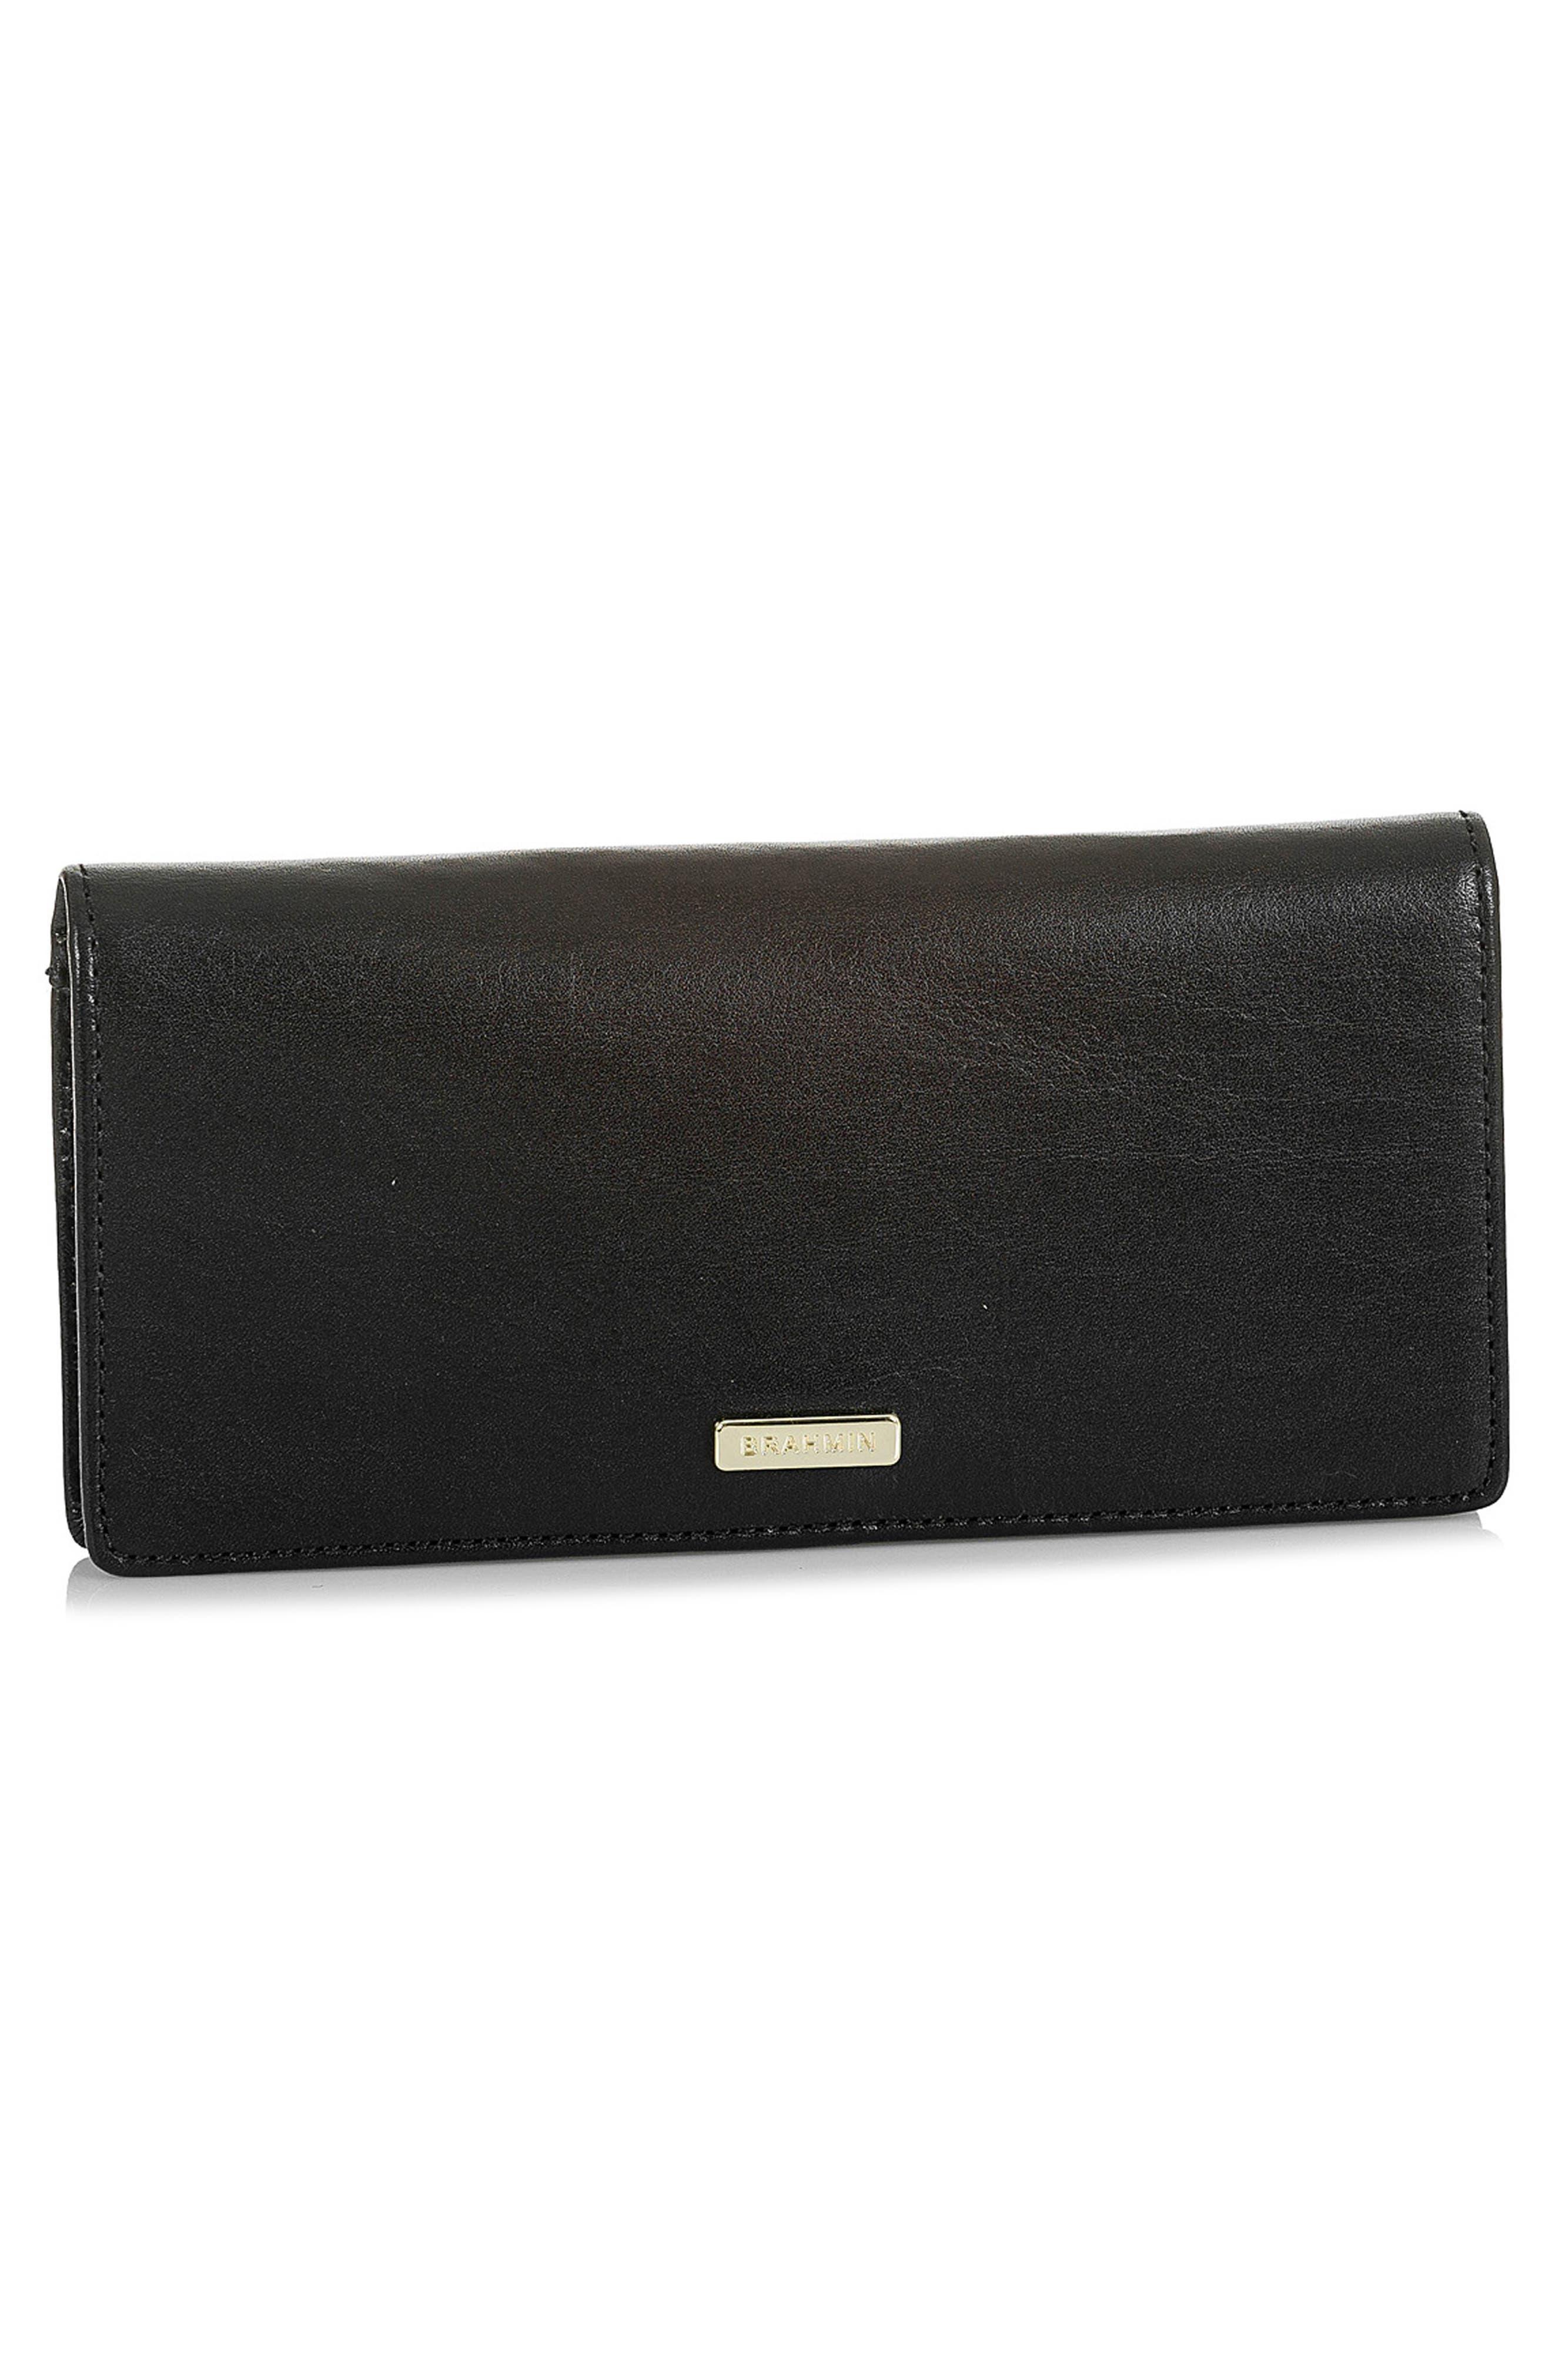 BRAHMIN, Ady Leather Wallet, Alternate thumbnail 4, color, 001